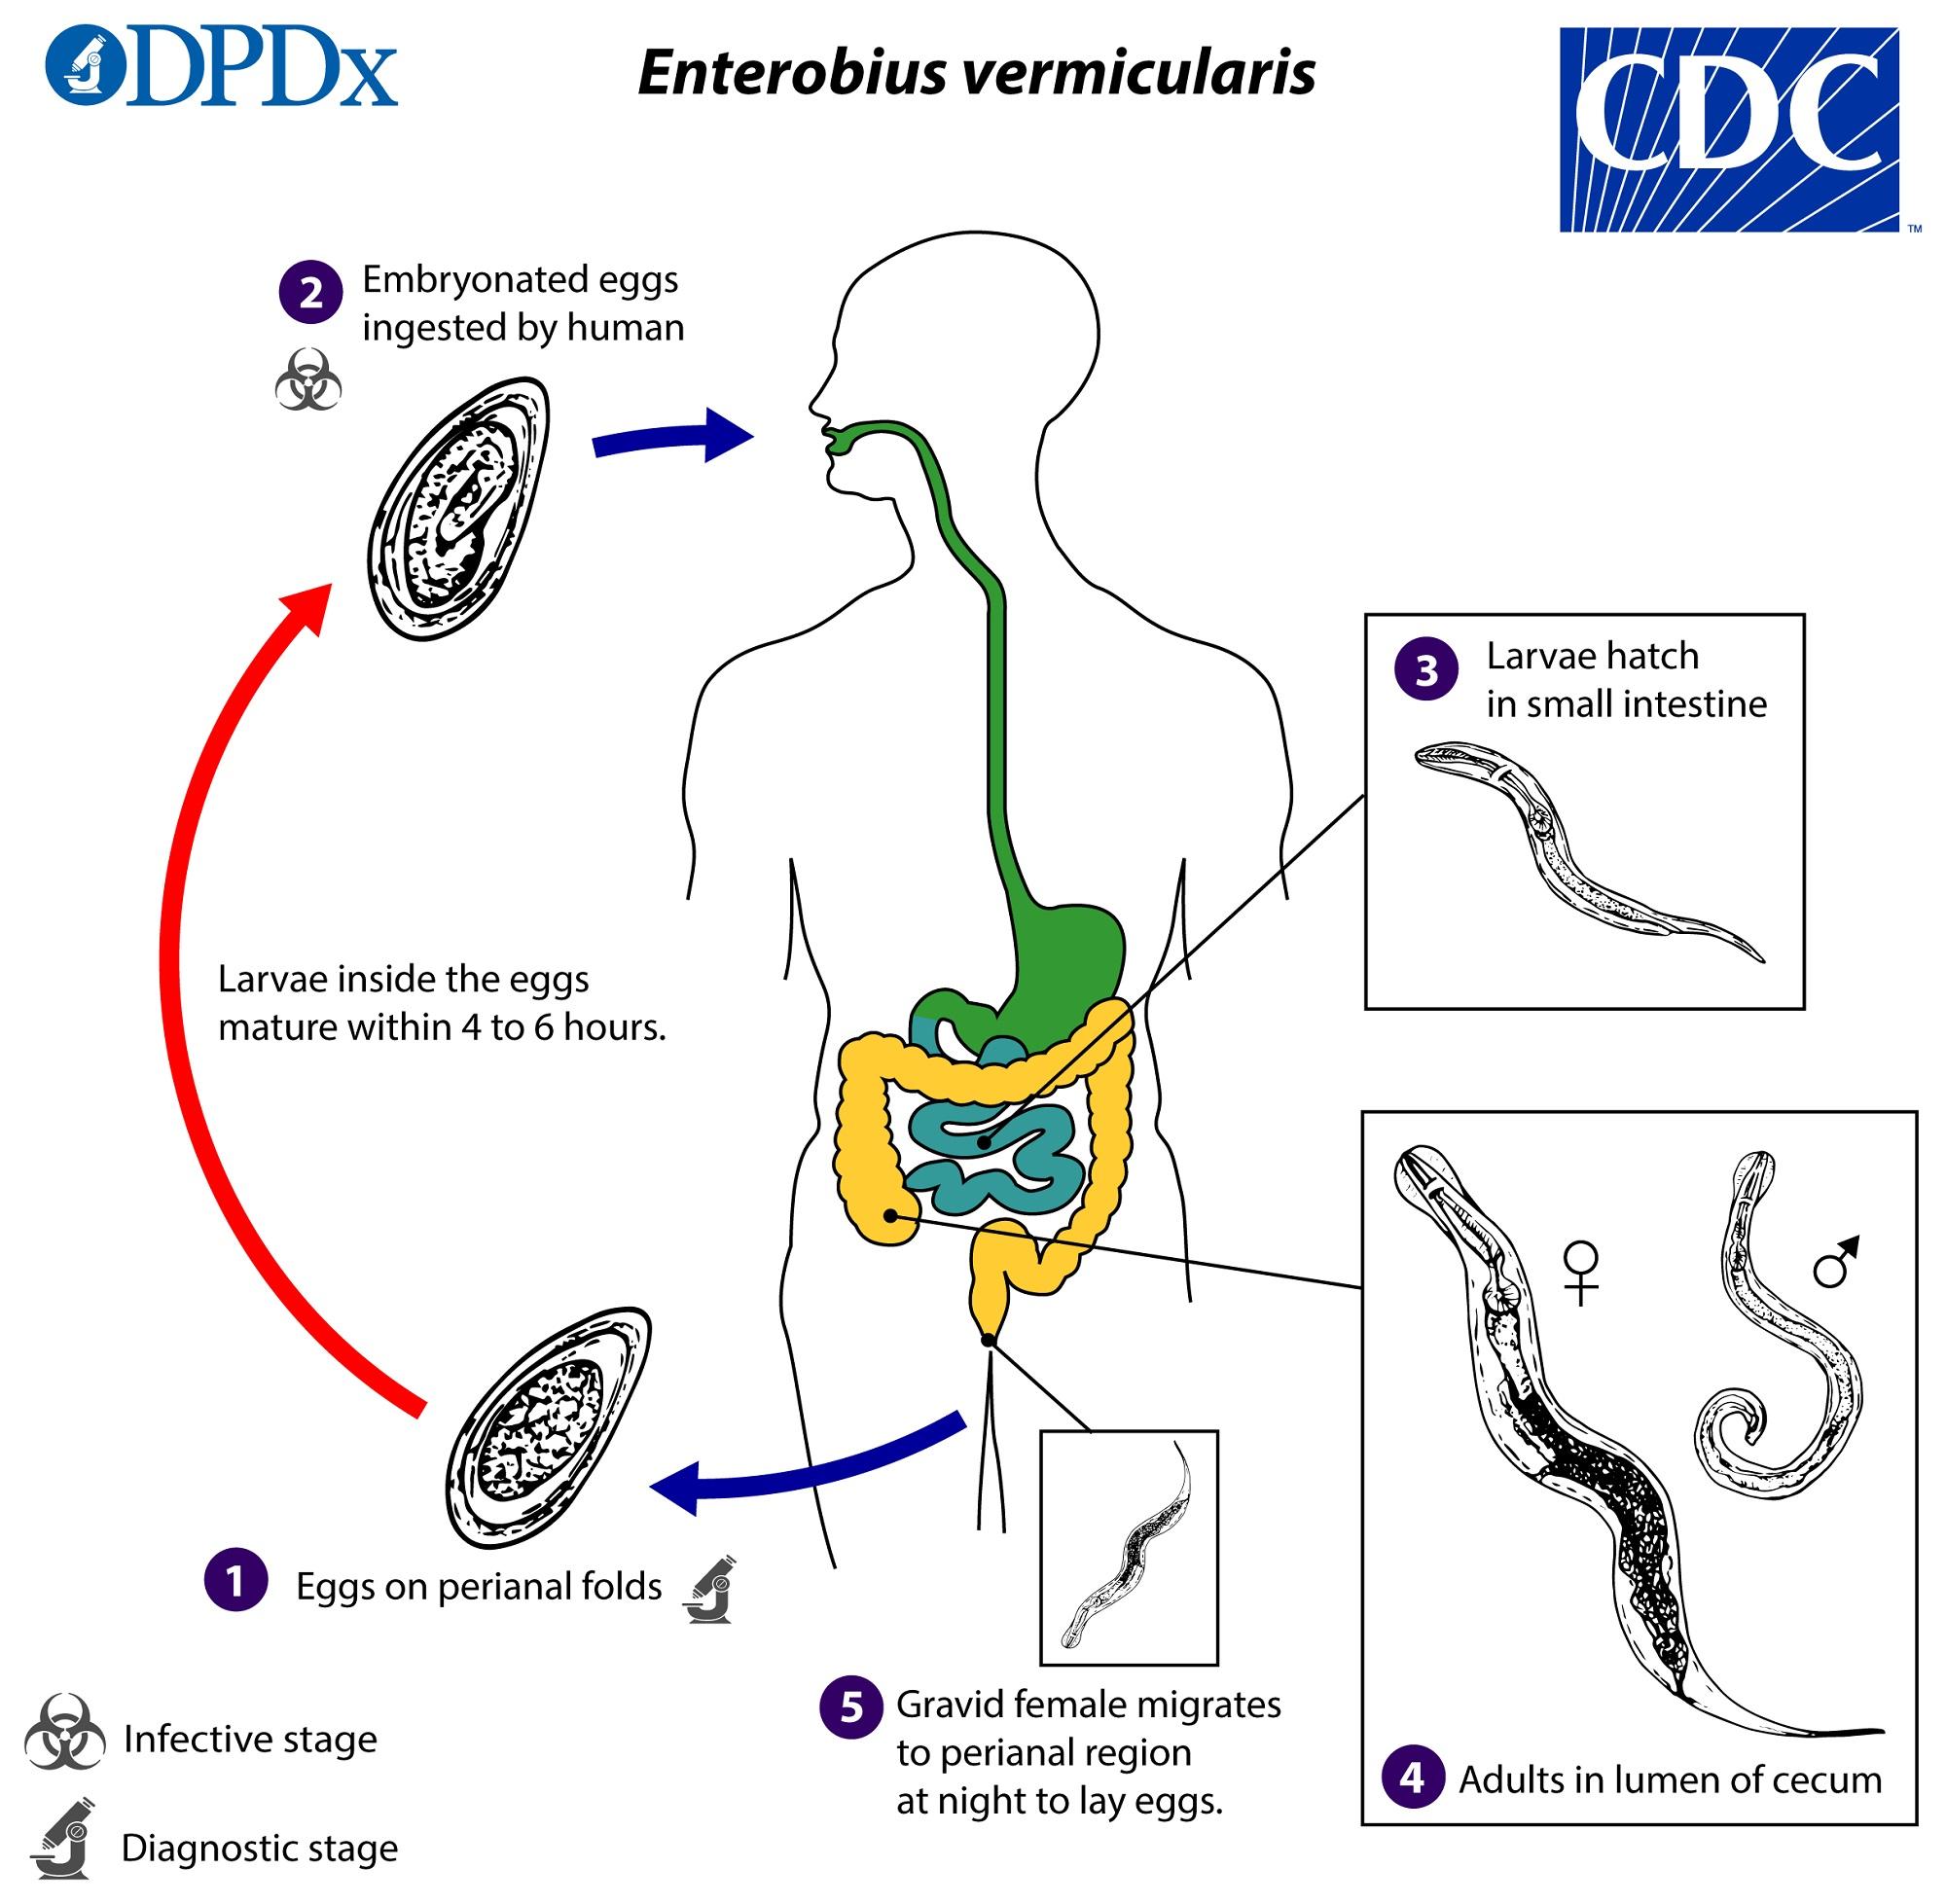 enterobius vermicularis virulence factors